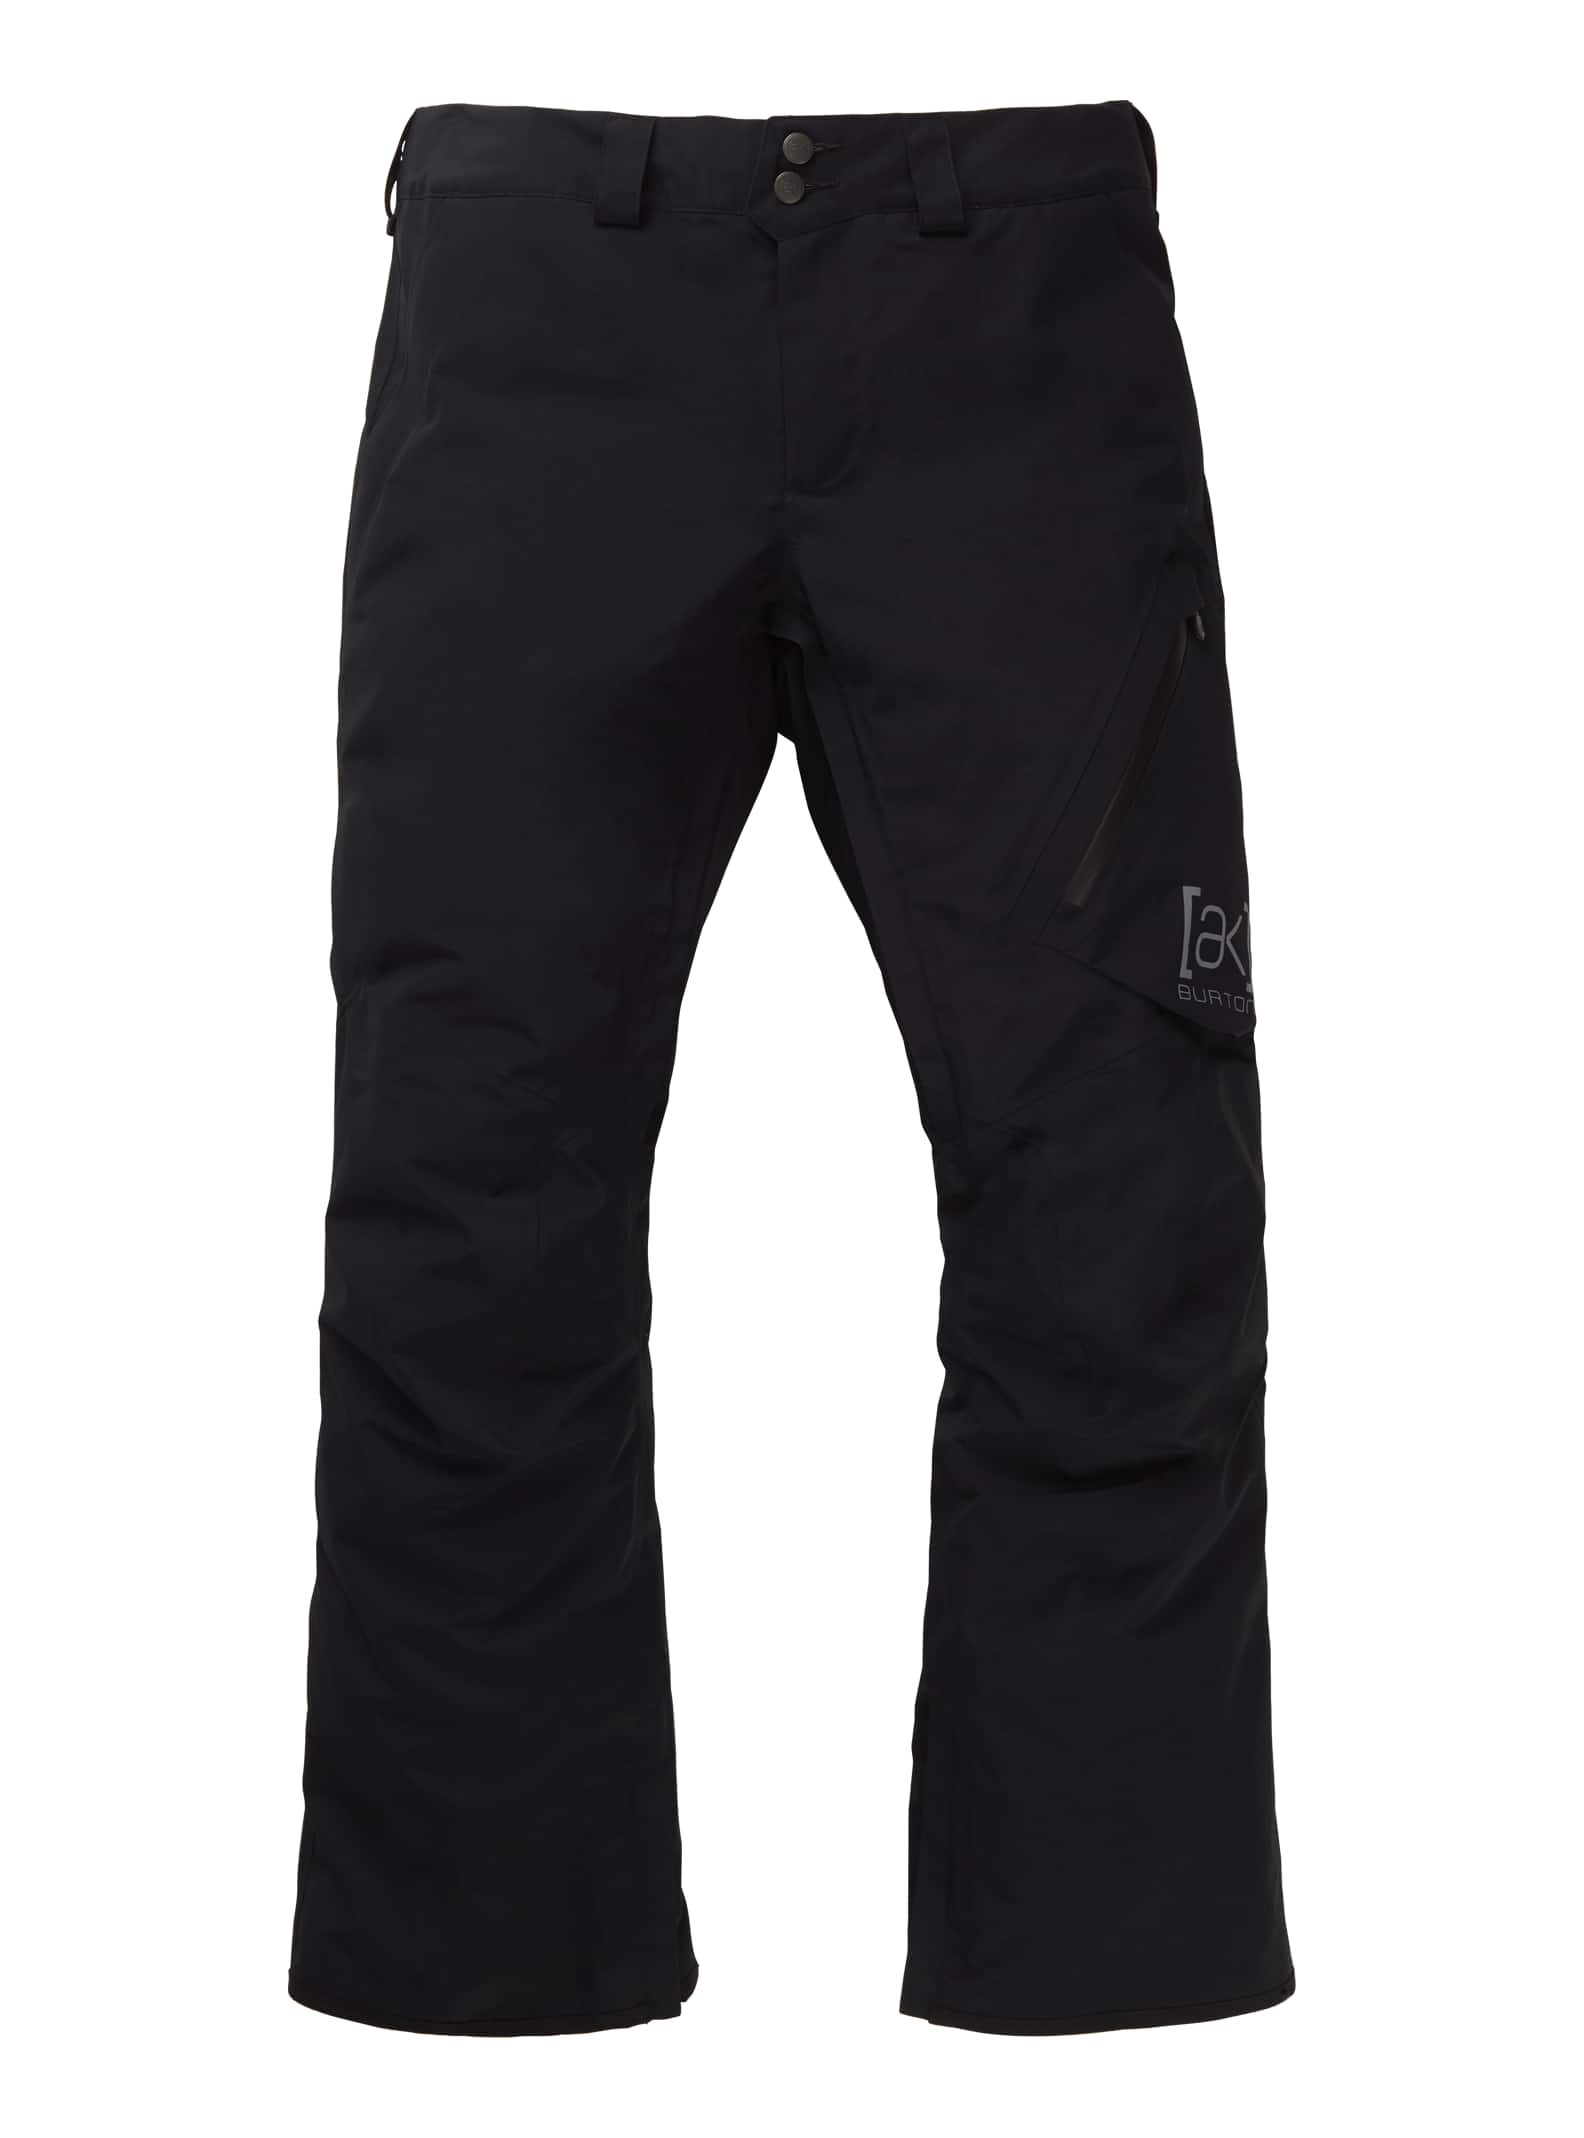 Burton [ak] GORE‑TEX Cyclicbyxa för herrar – hög passform, XL